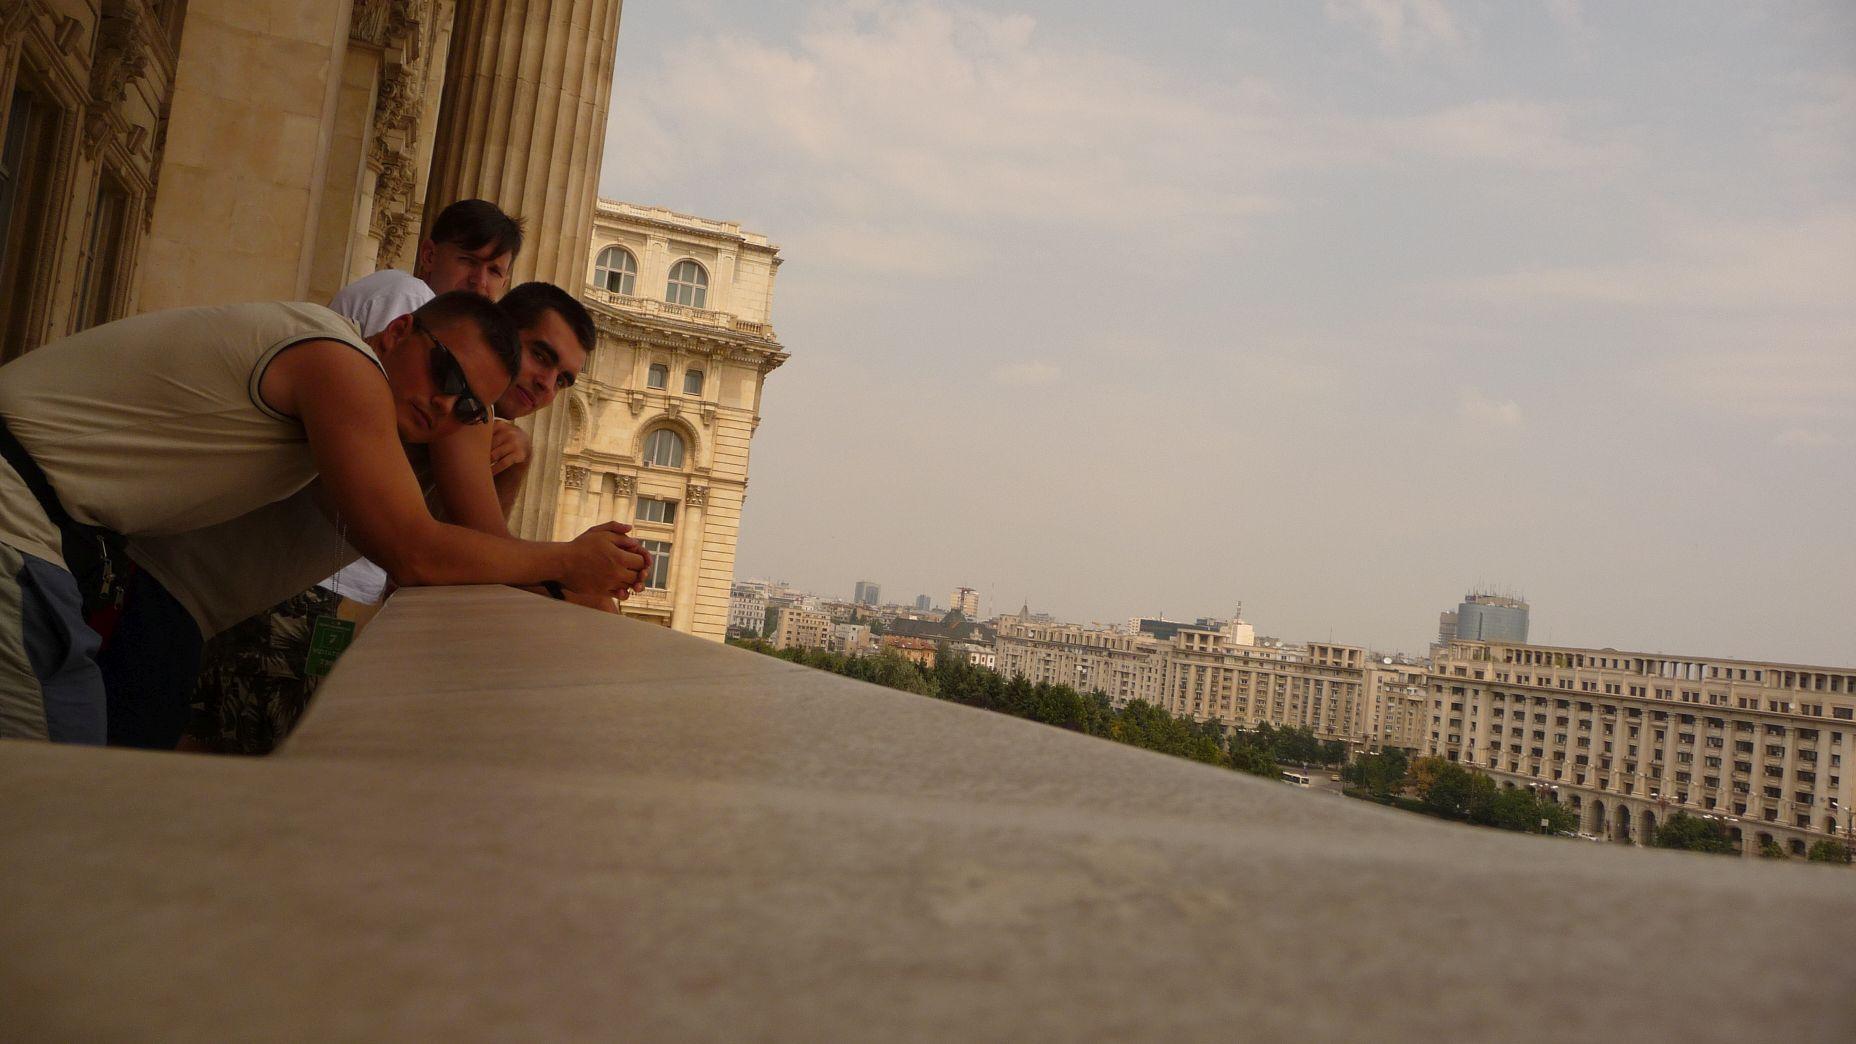 Rumunia - Bukareszt - zdjęcia, atrakcje